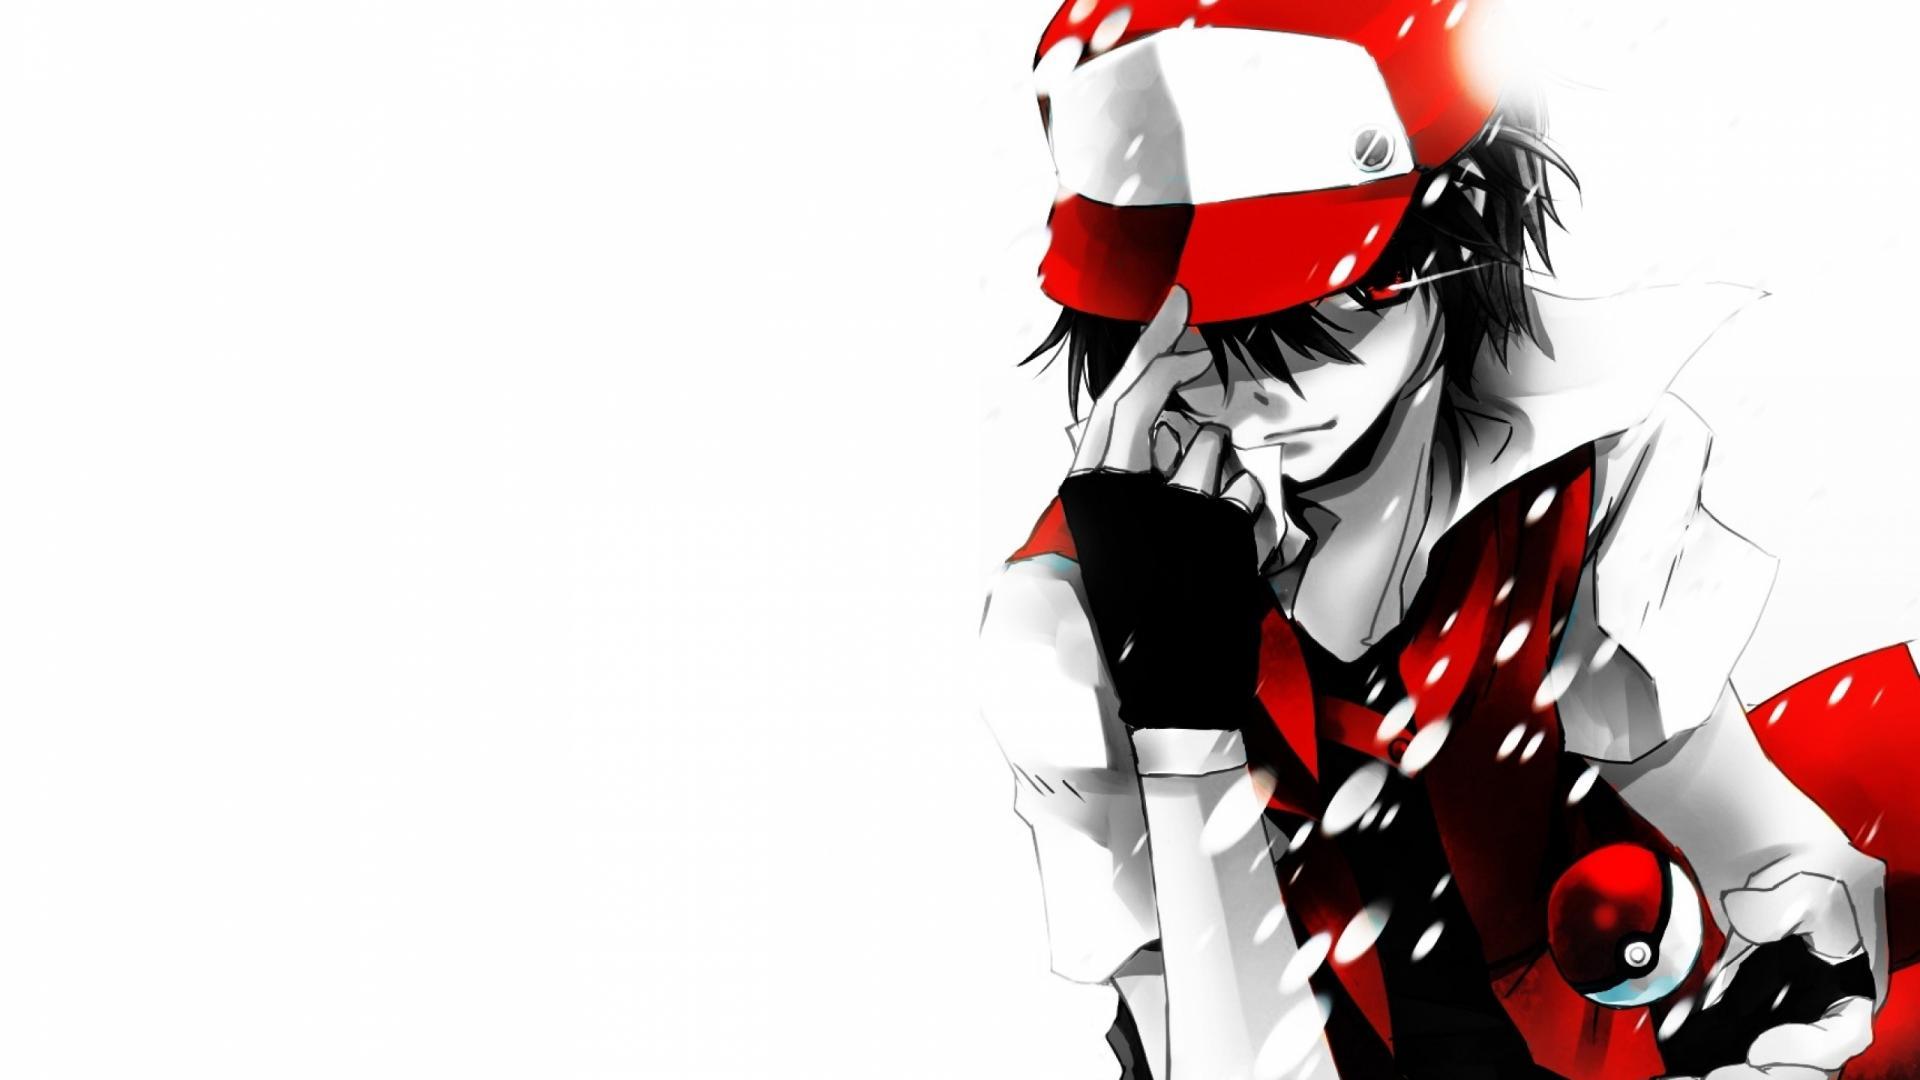 Download-Red-Pokemon-Ash-1920x1080-Full-HD-wallpaper-wp3605058